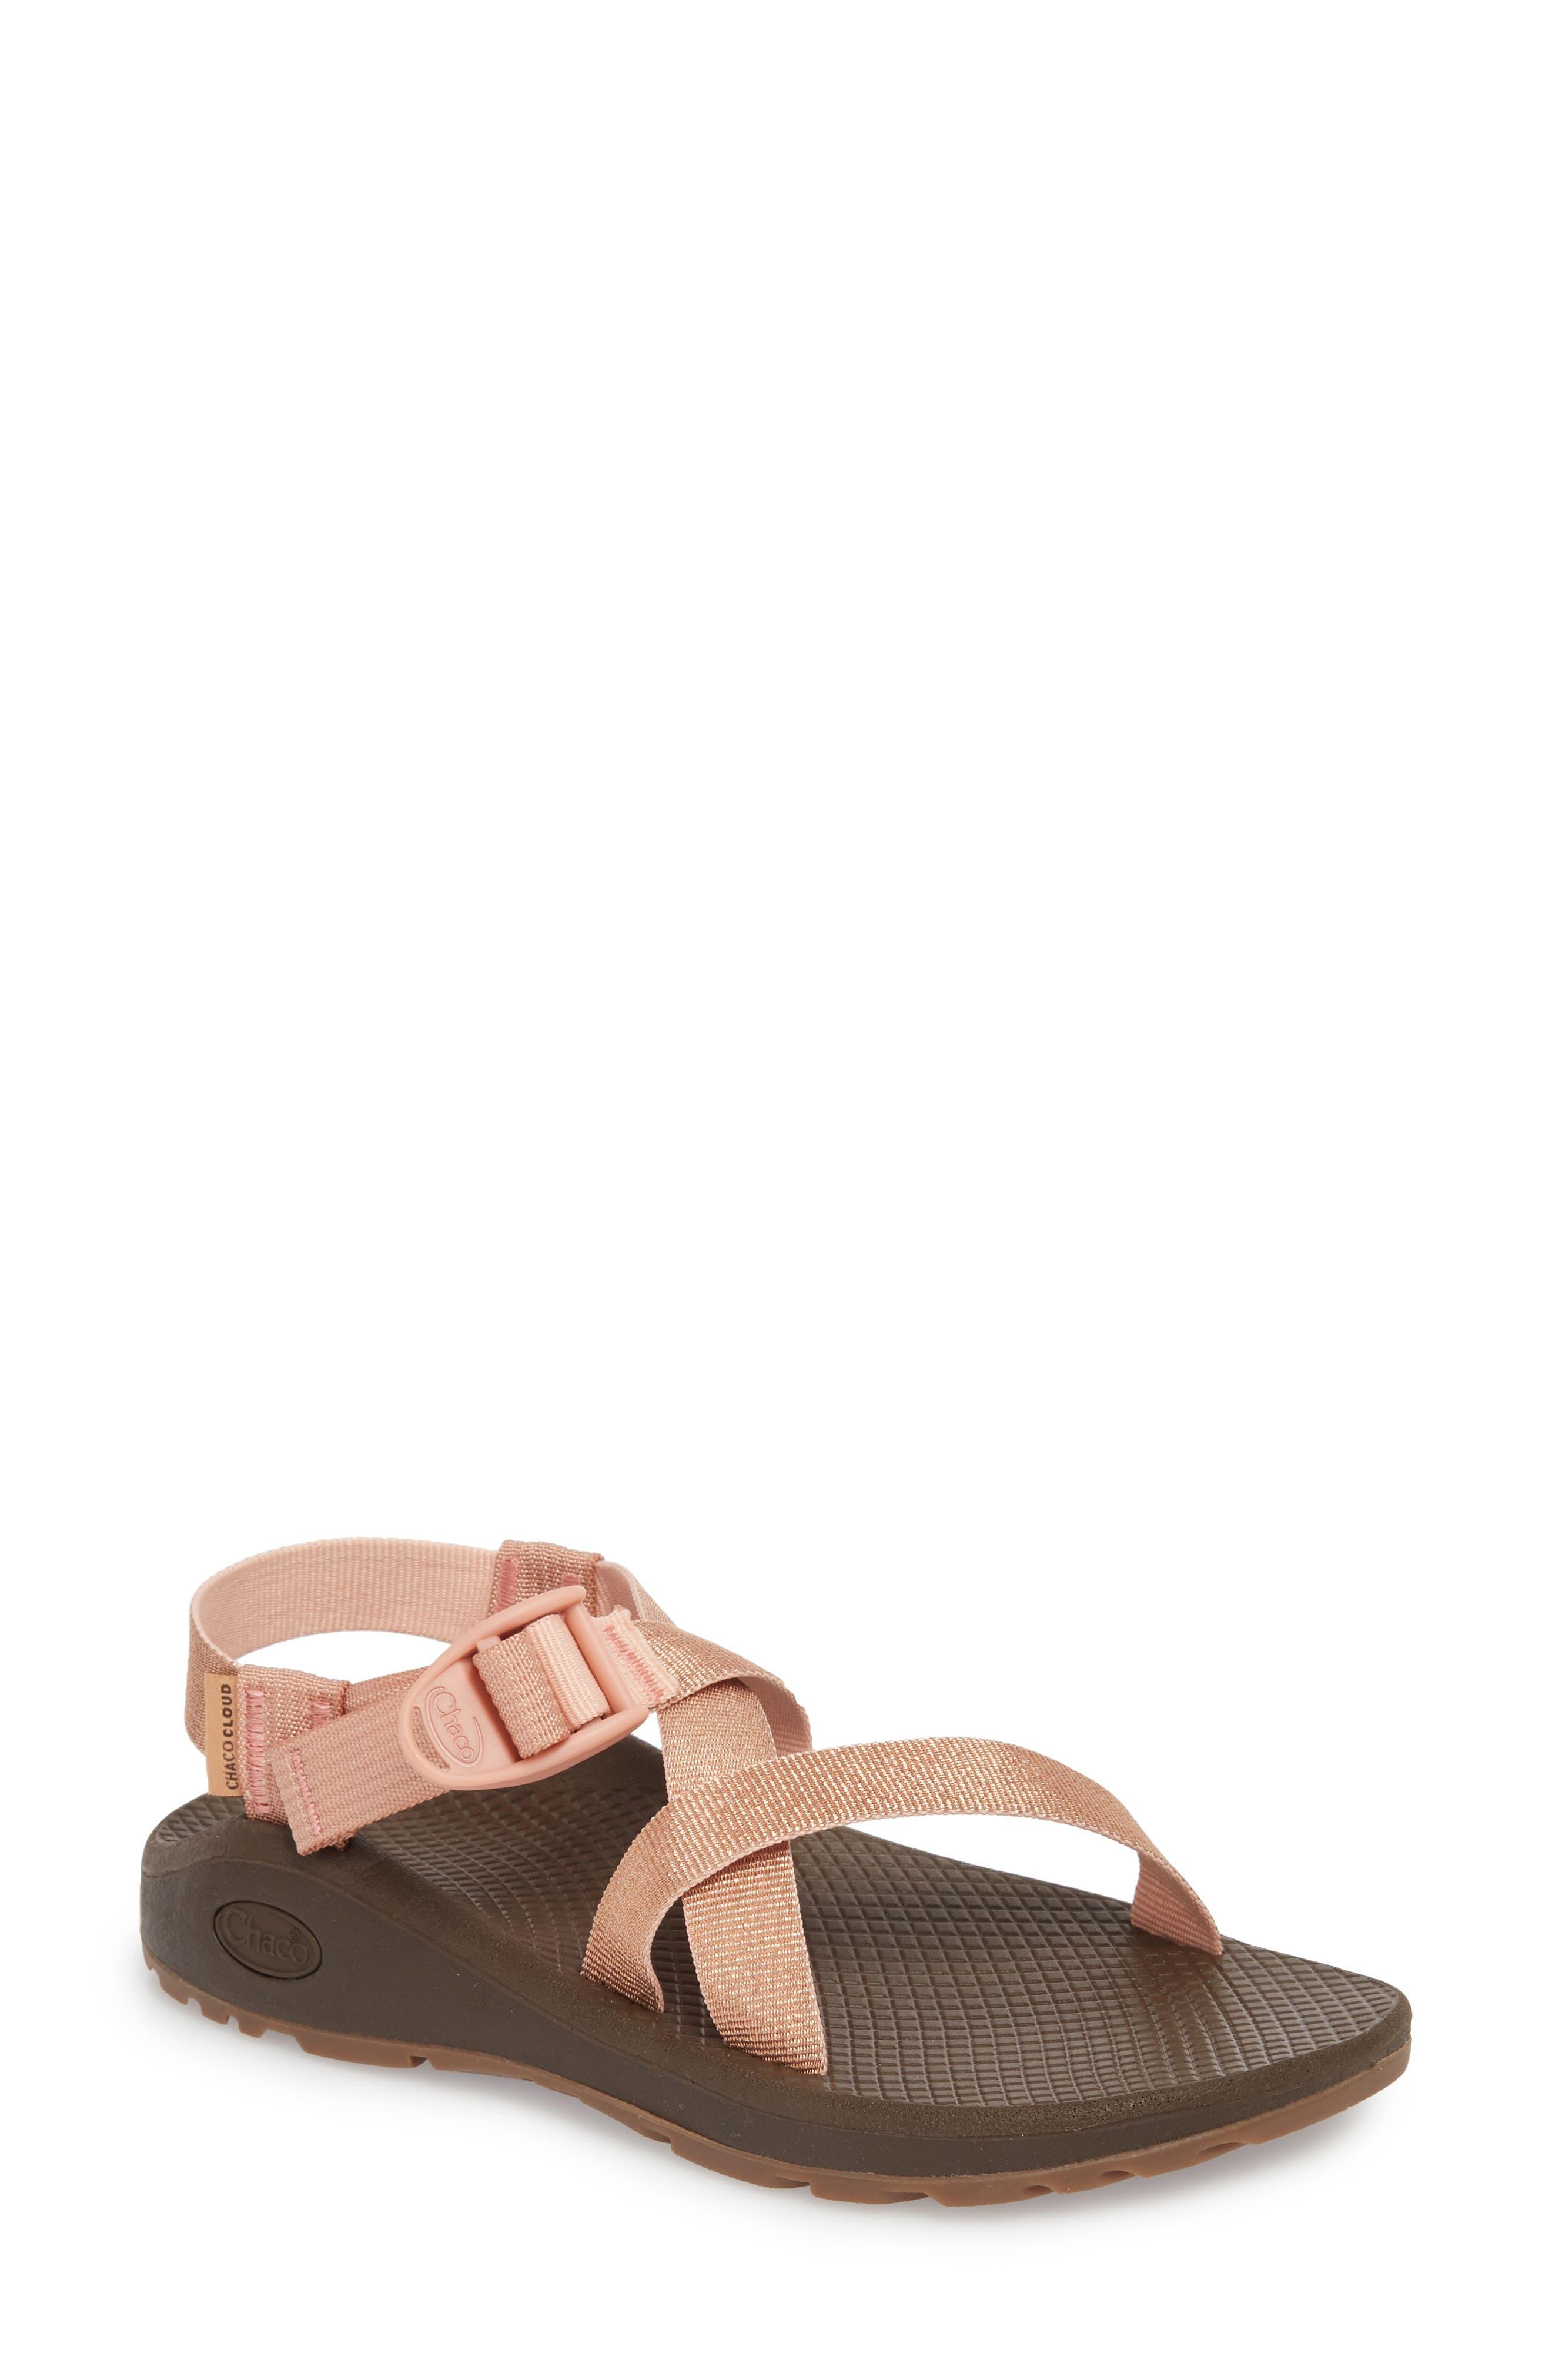 Z/Cloud Sandal,                         Main,                         color, Metallic Rose Leather